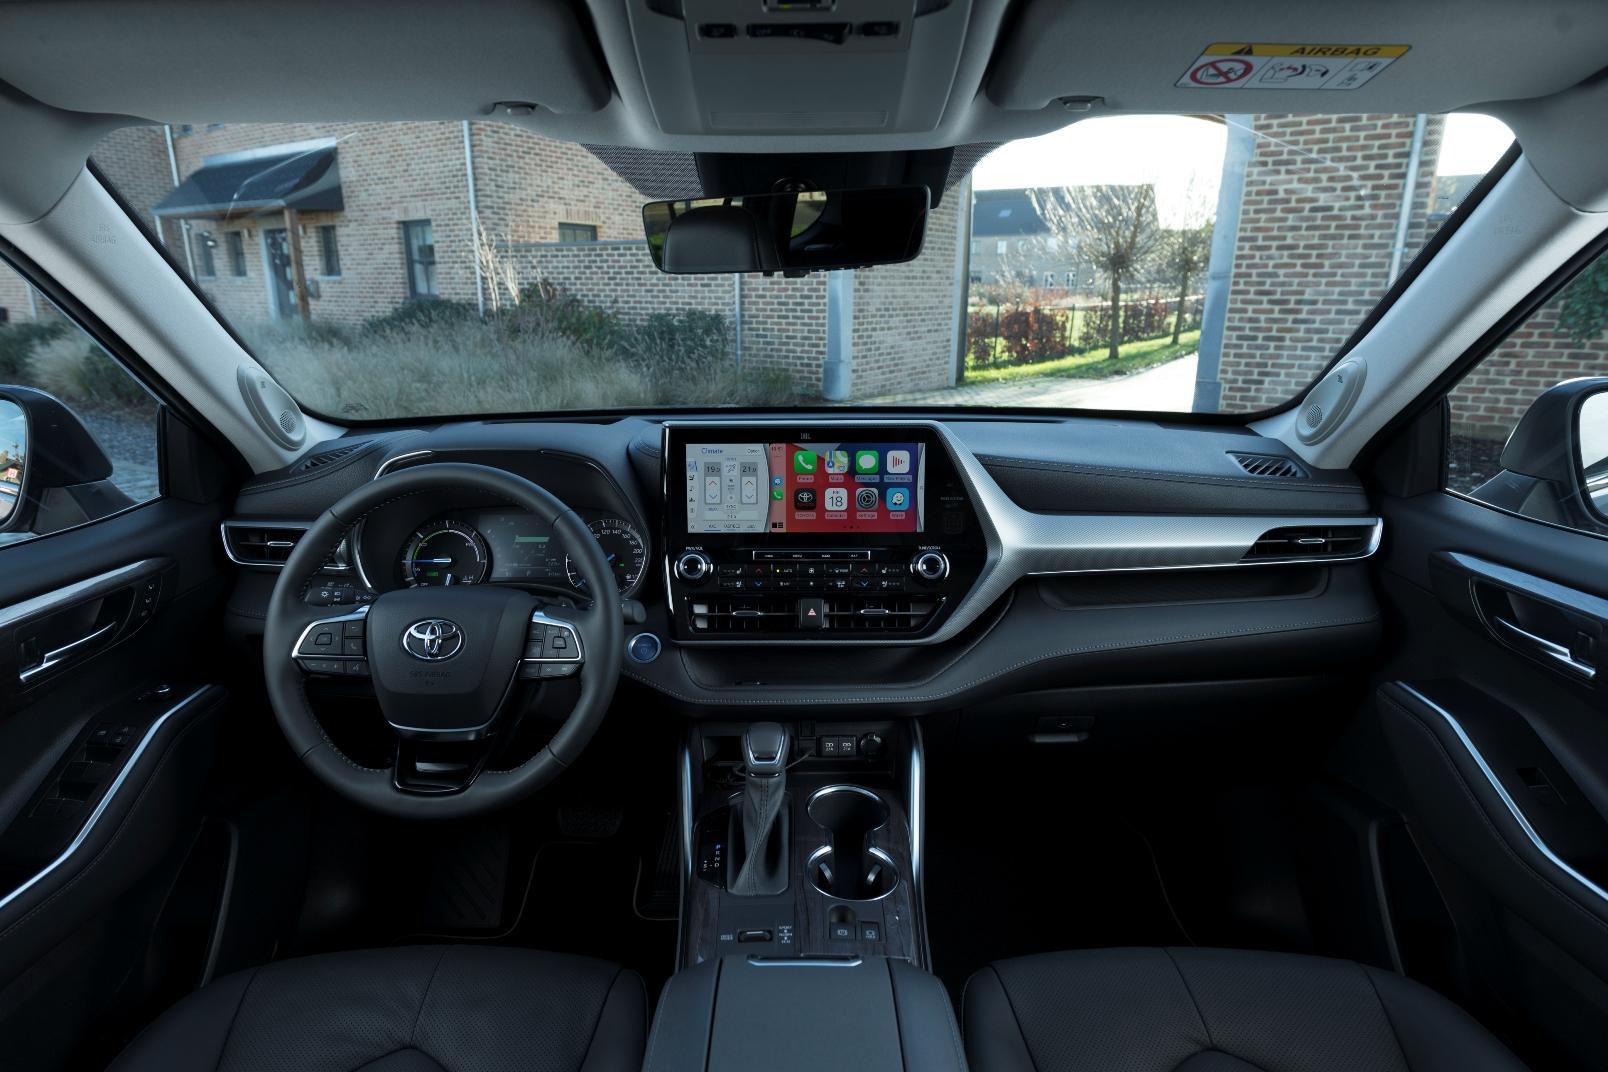 Toyota Highlander Electric Hybrid (14)